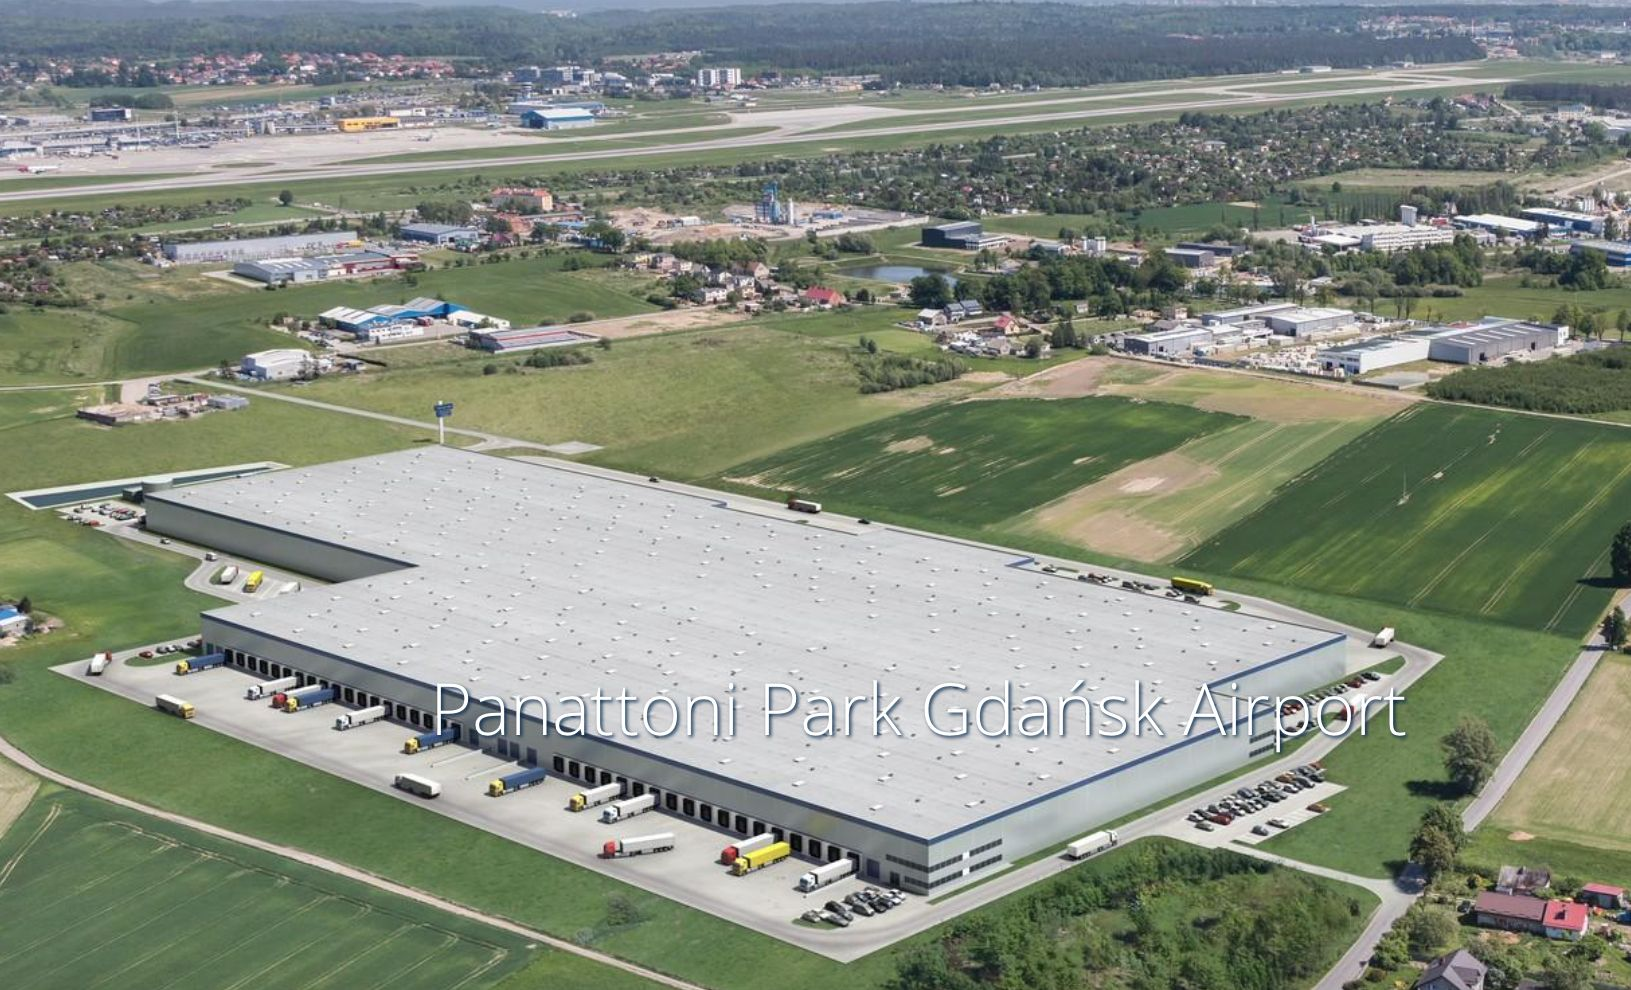 Panattoni Park Gdańsk Airport